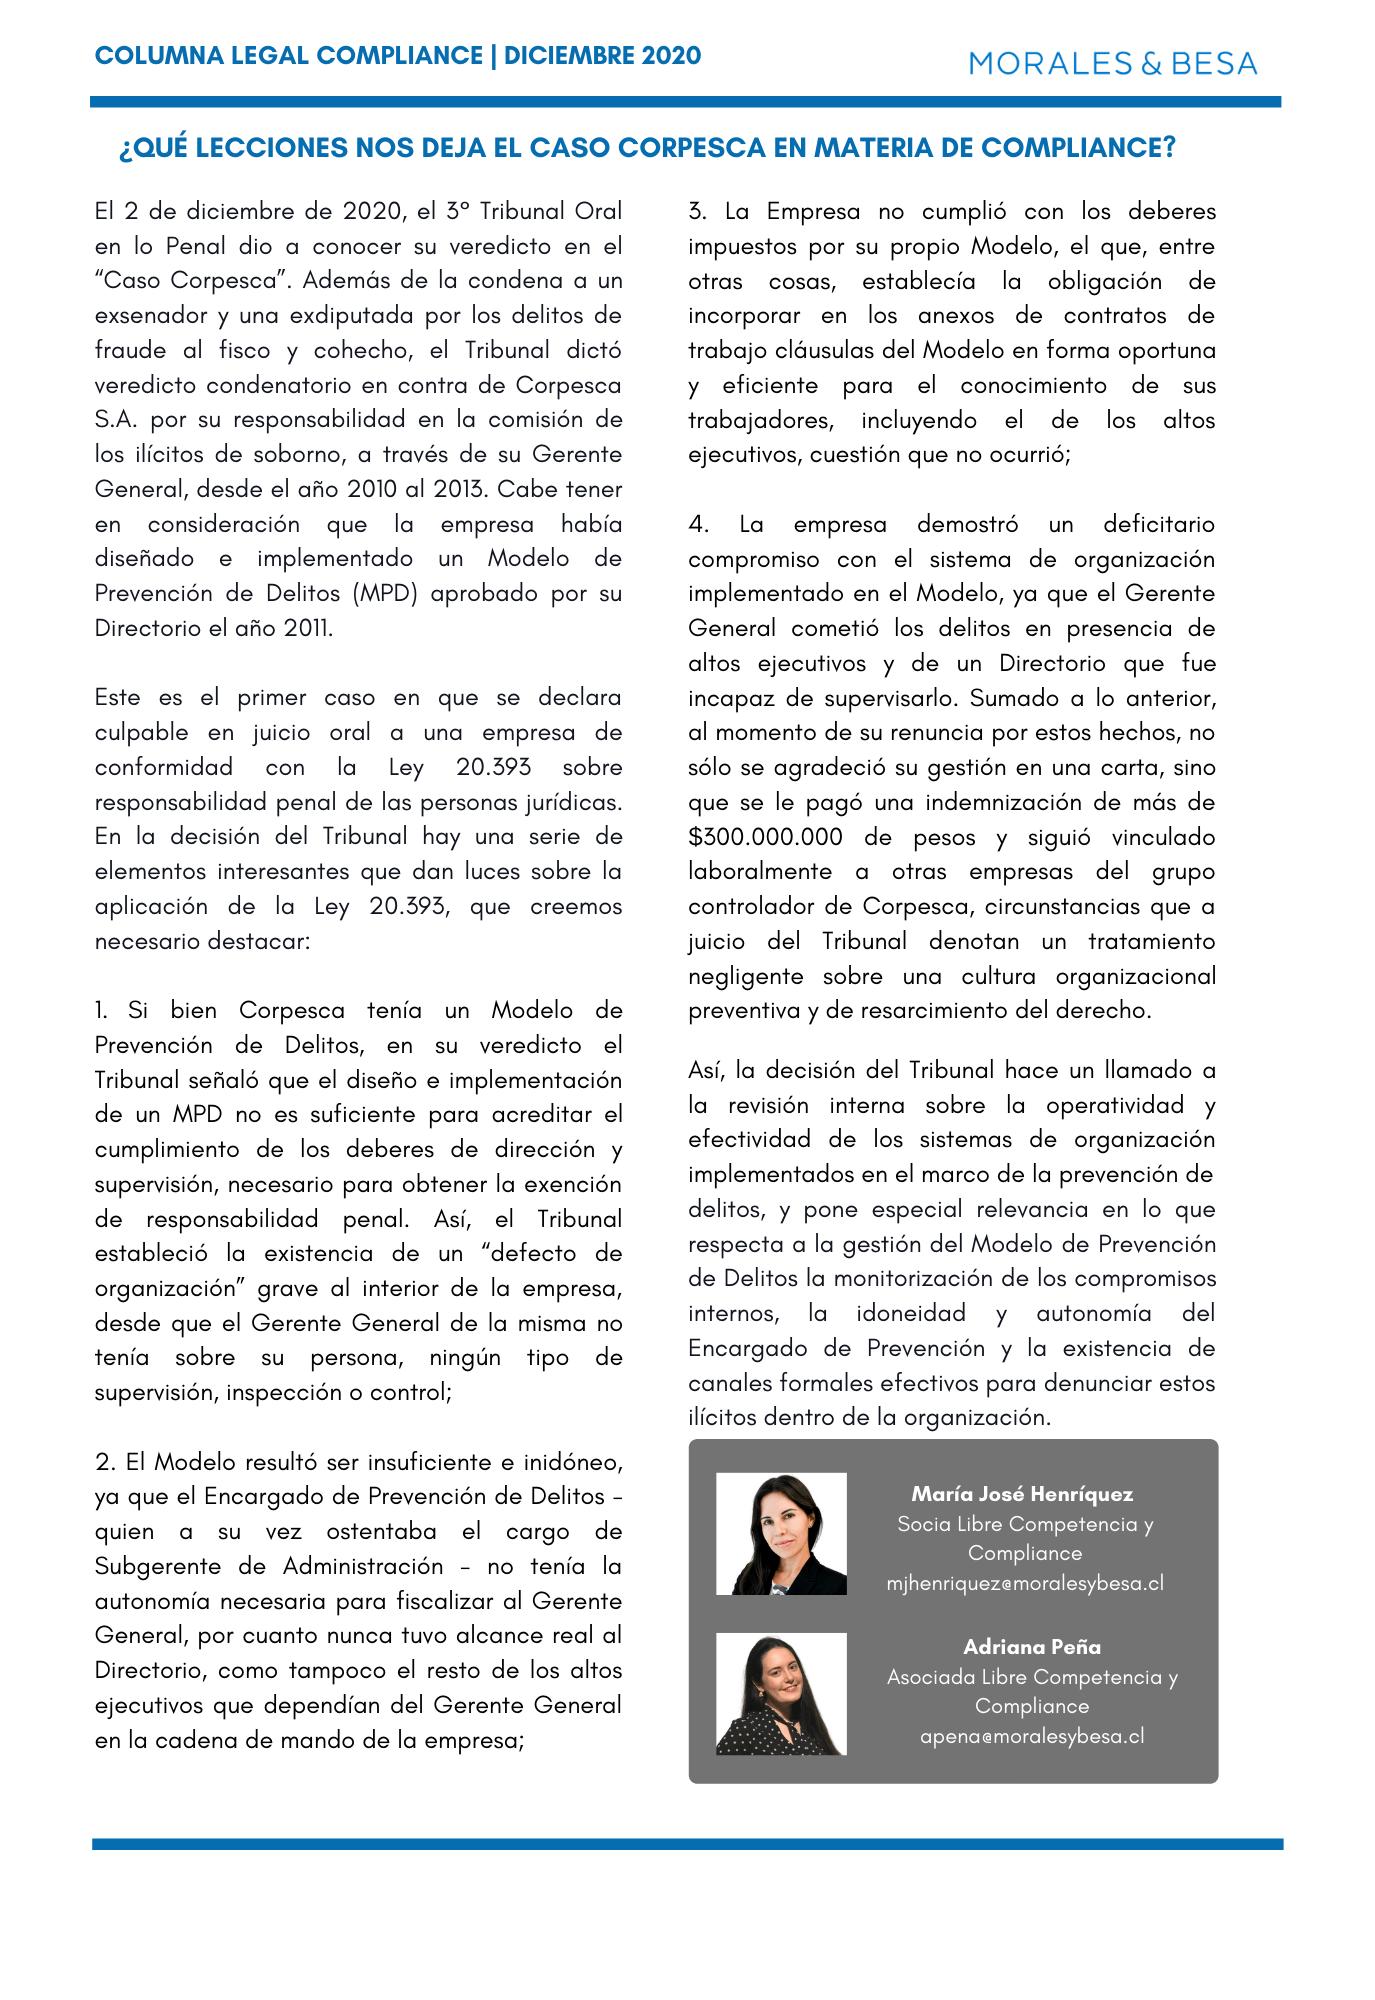 Columna Legal Compliance - Caso Corpesca (2)